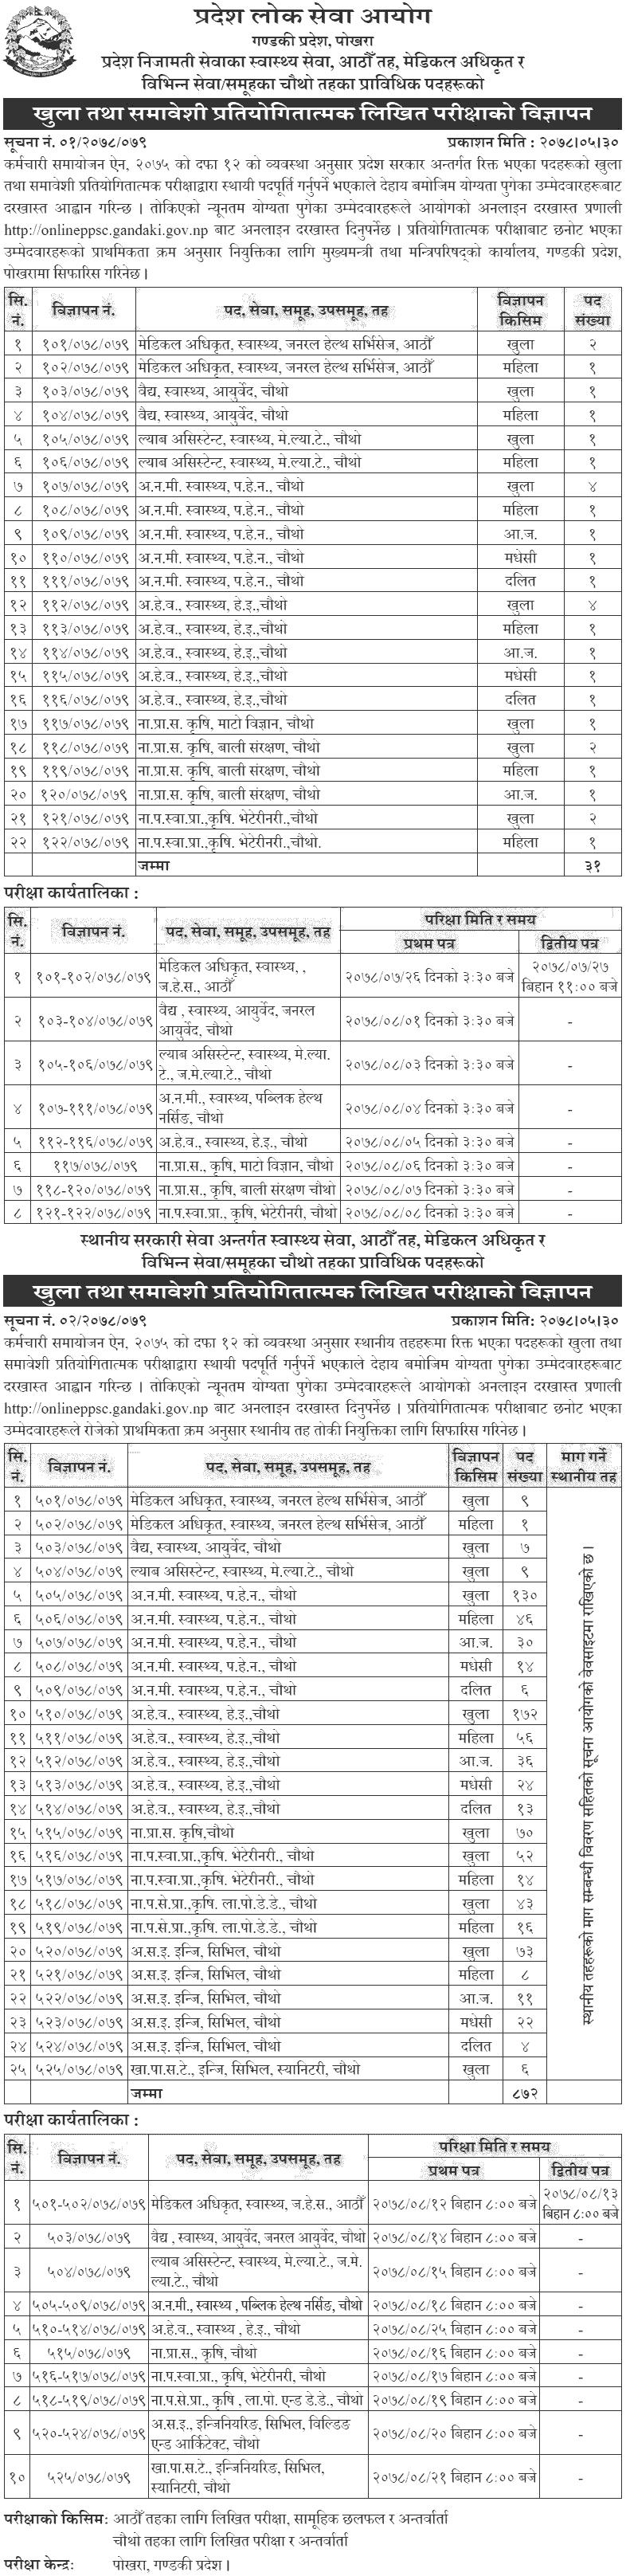 Gandaki Pradesh Lok Sewa Aayog Vacancy for Health Services